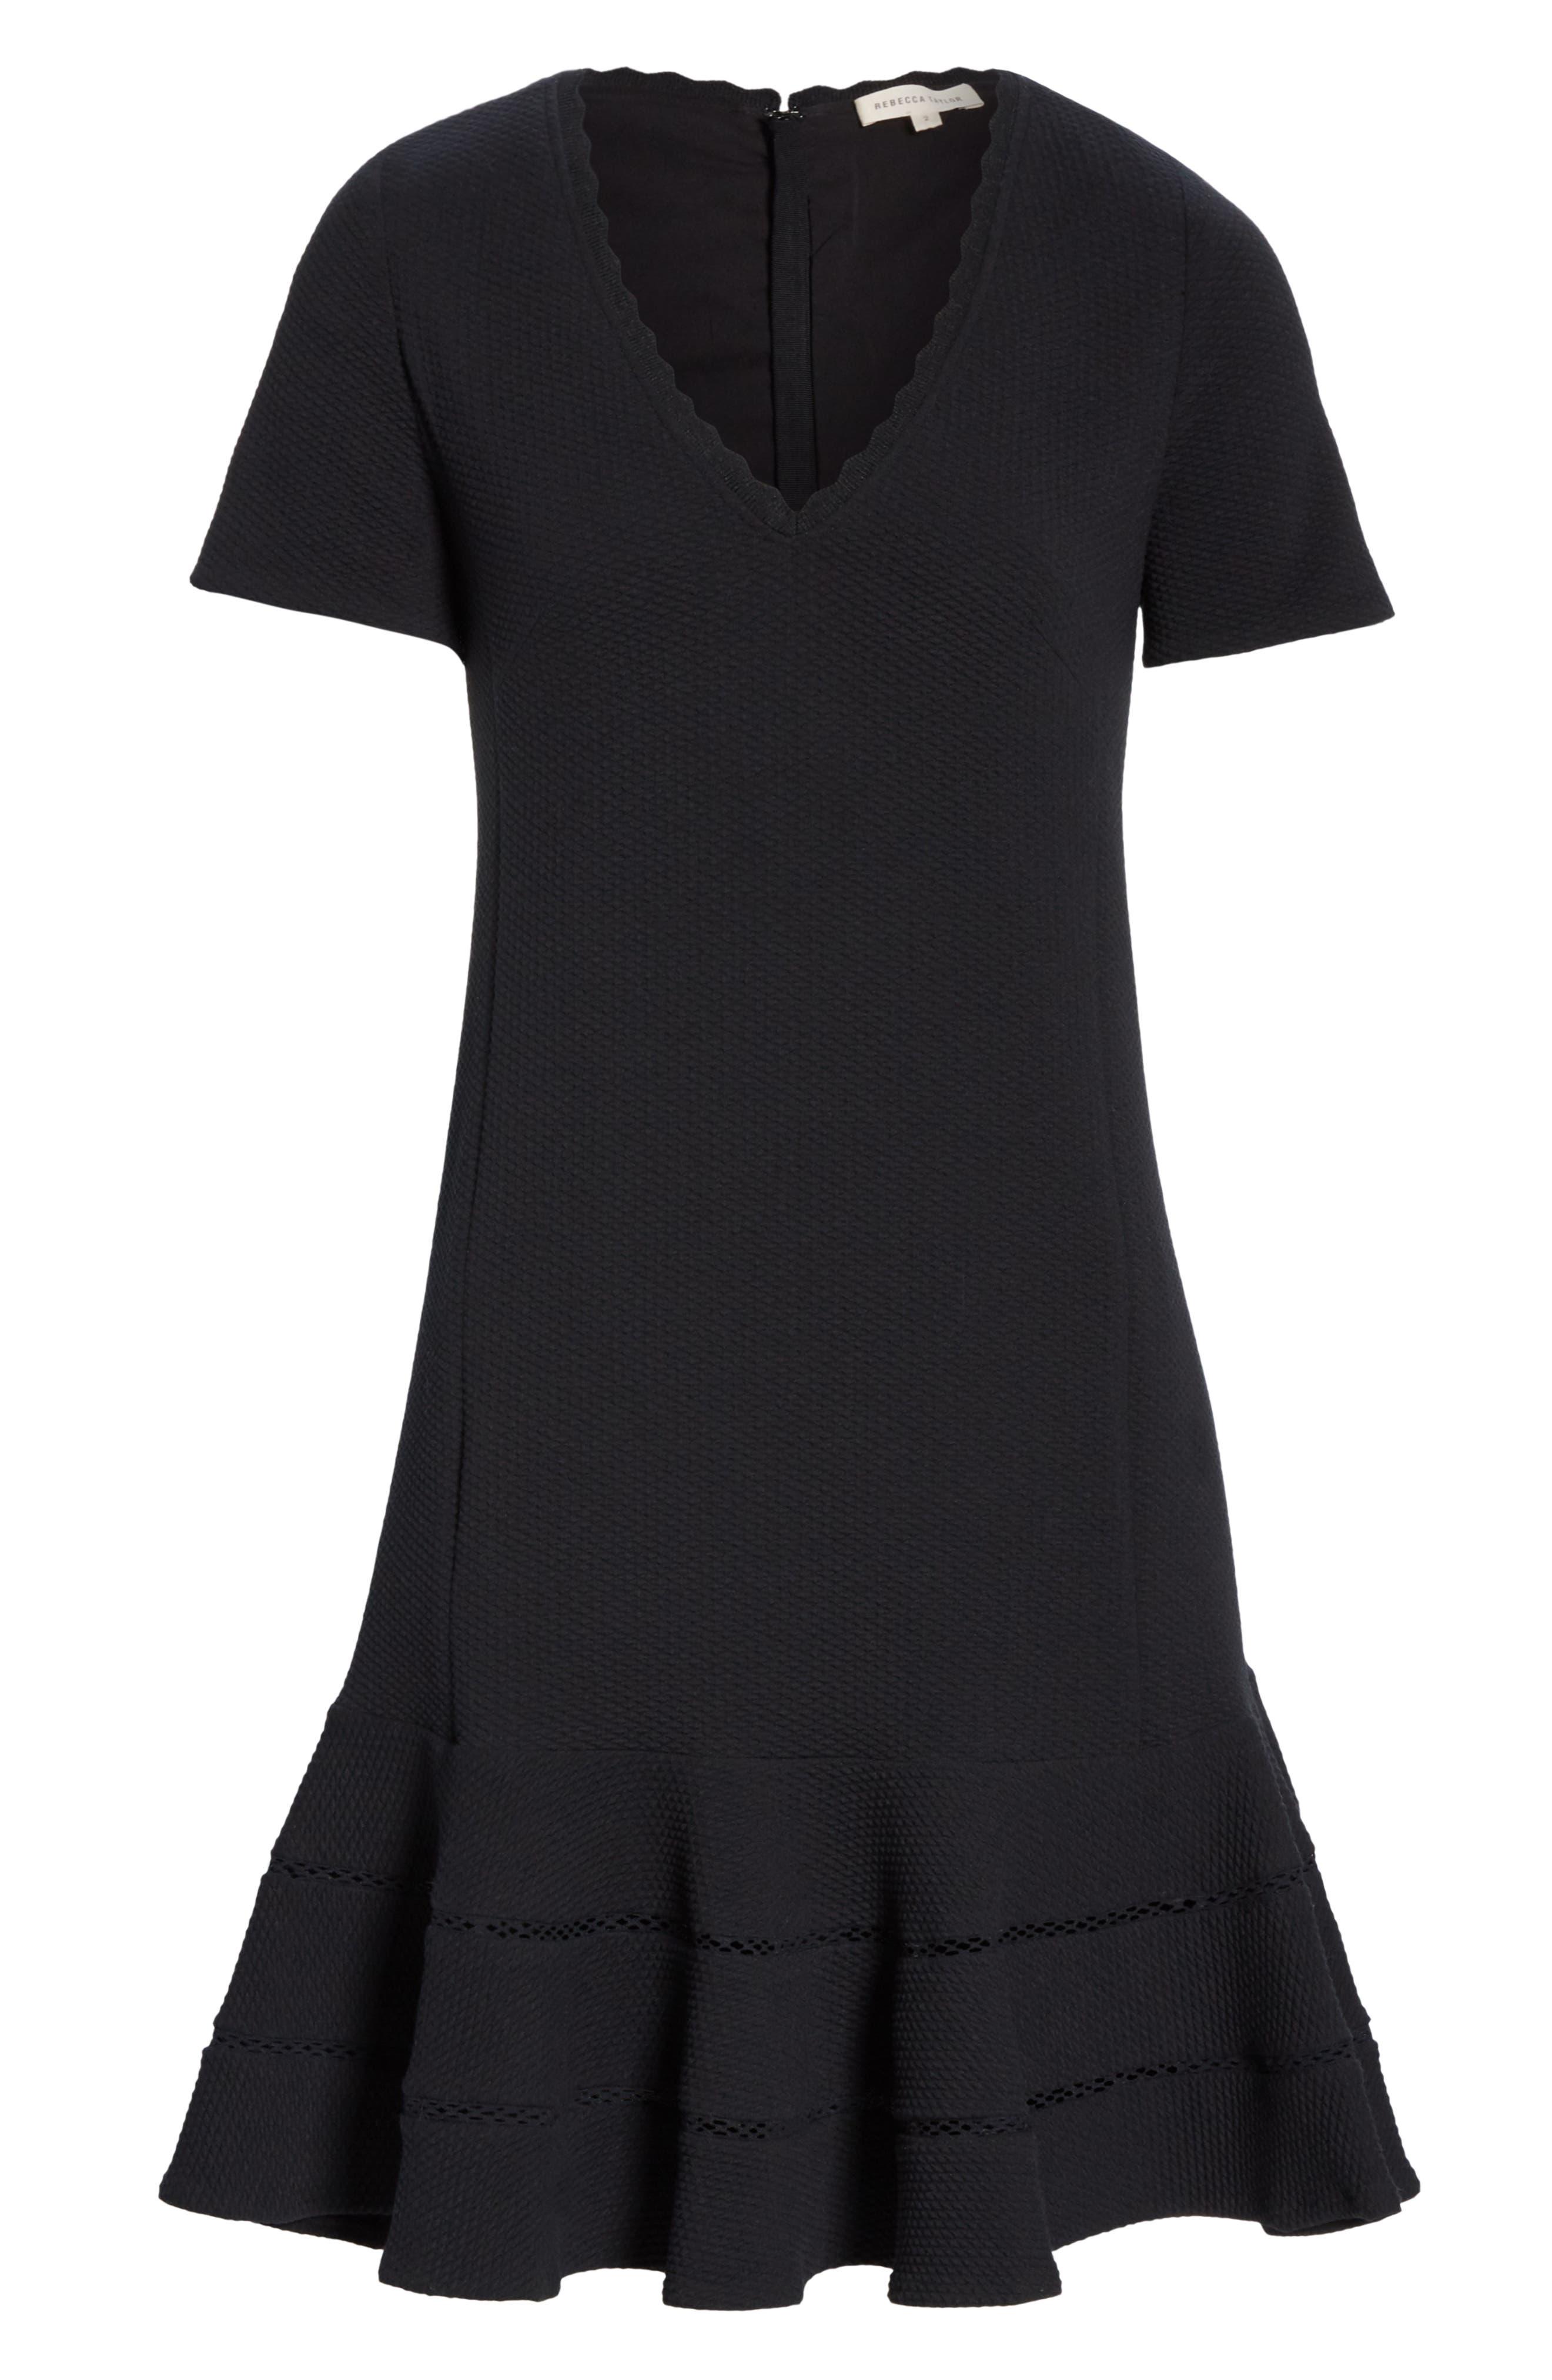 REBECCA TAYLOR, Fit & Flare Dress, Alternate thumbnail 6, color, BLACK